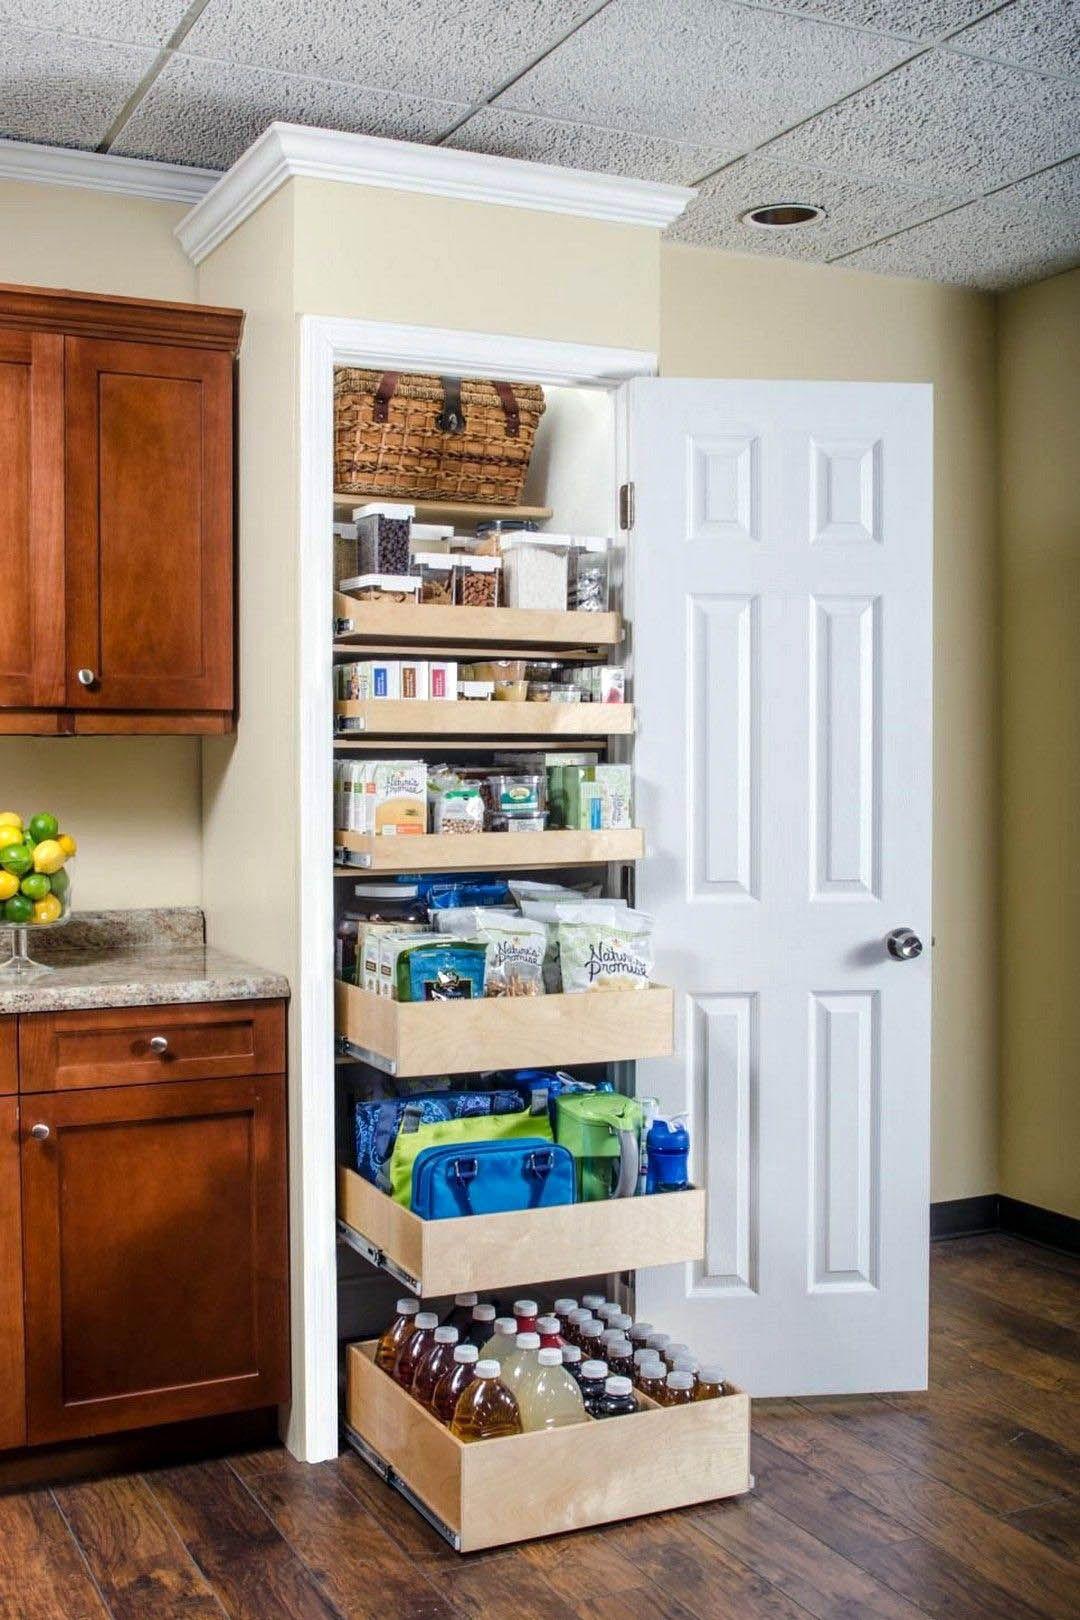 Unfamiliar Horizontal Kitchen Storage Cabinets Just On Smarthomefi Com Pantry Design Diy Kitchen Storage Pantry Organizers